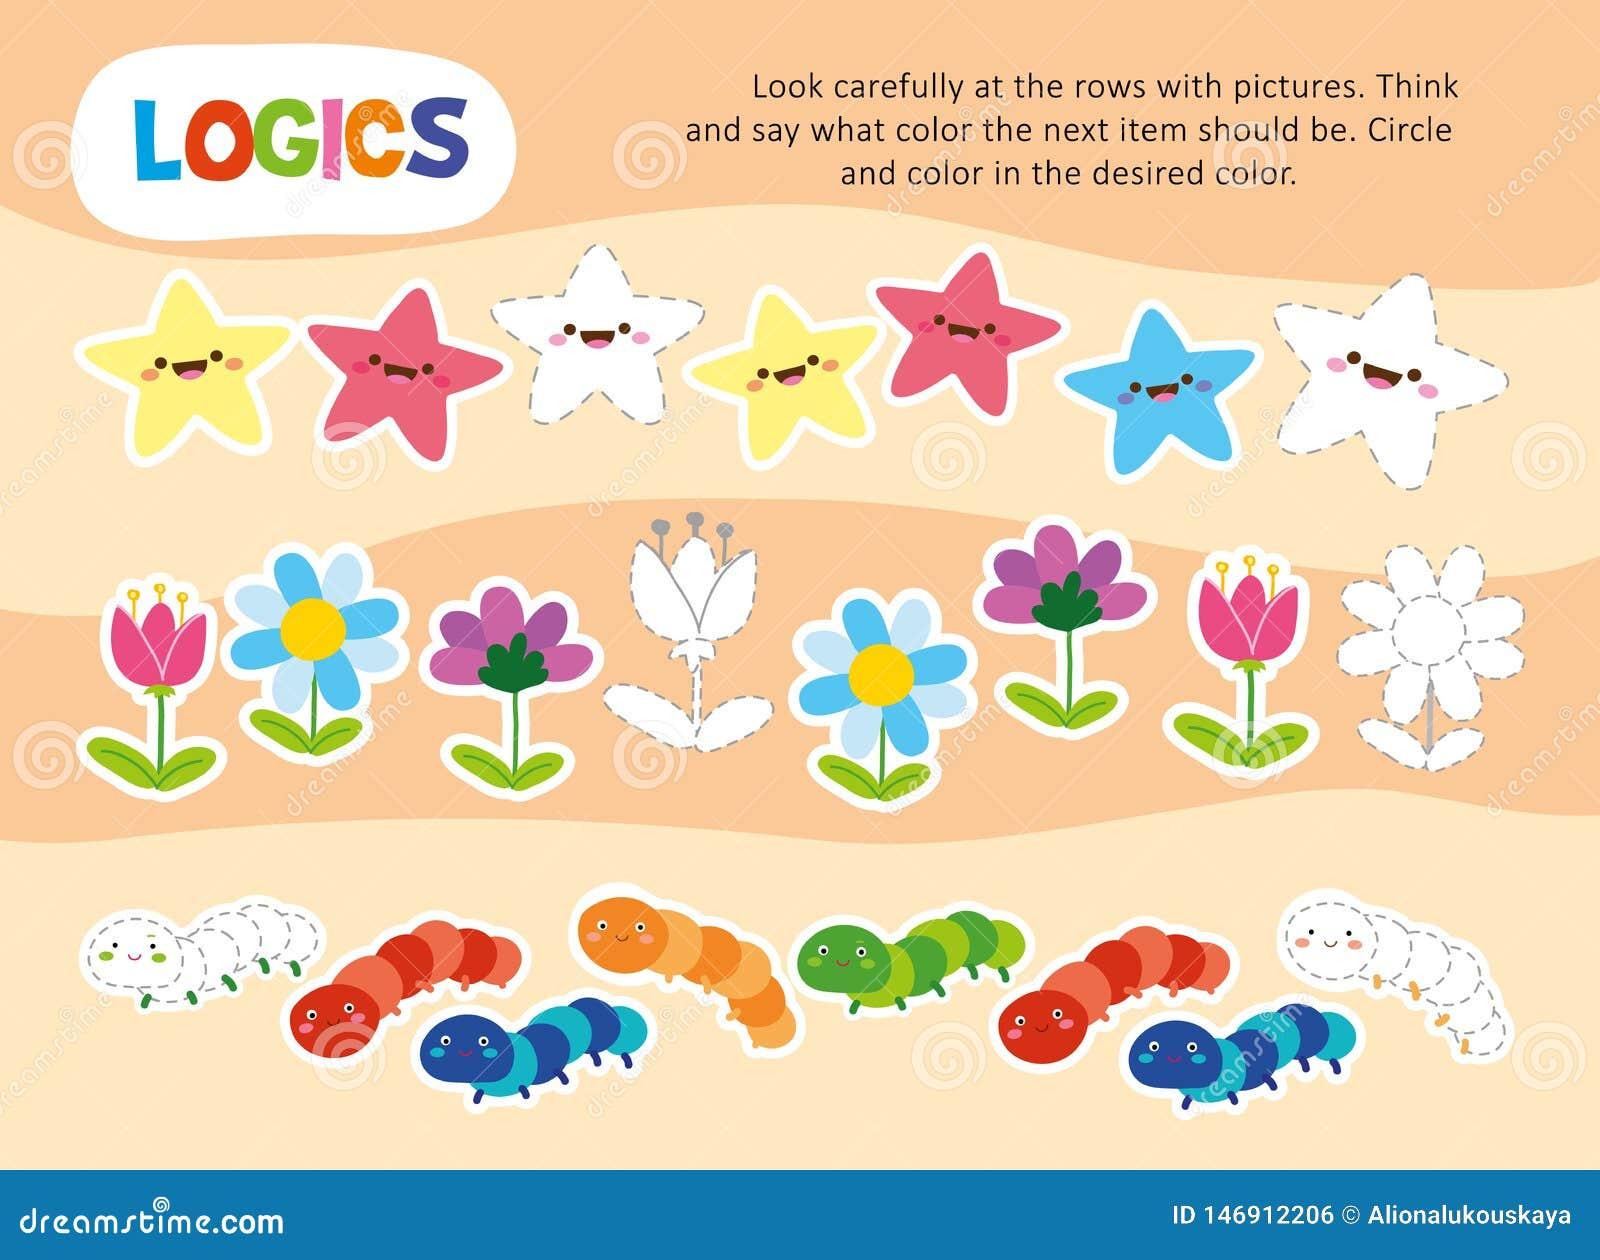 Logic Color Chain Kid Game Printable Worksheet Stock ...